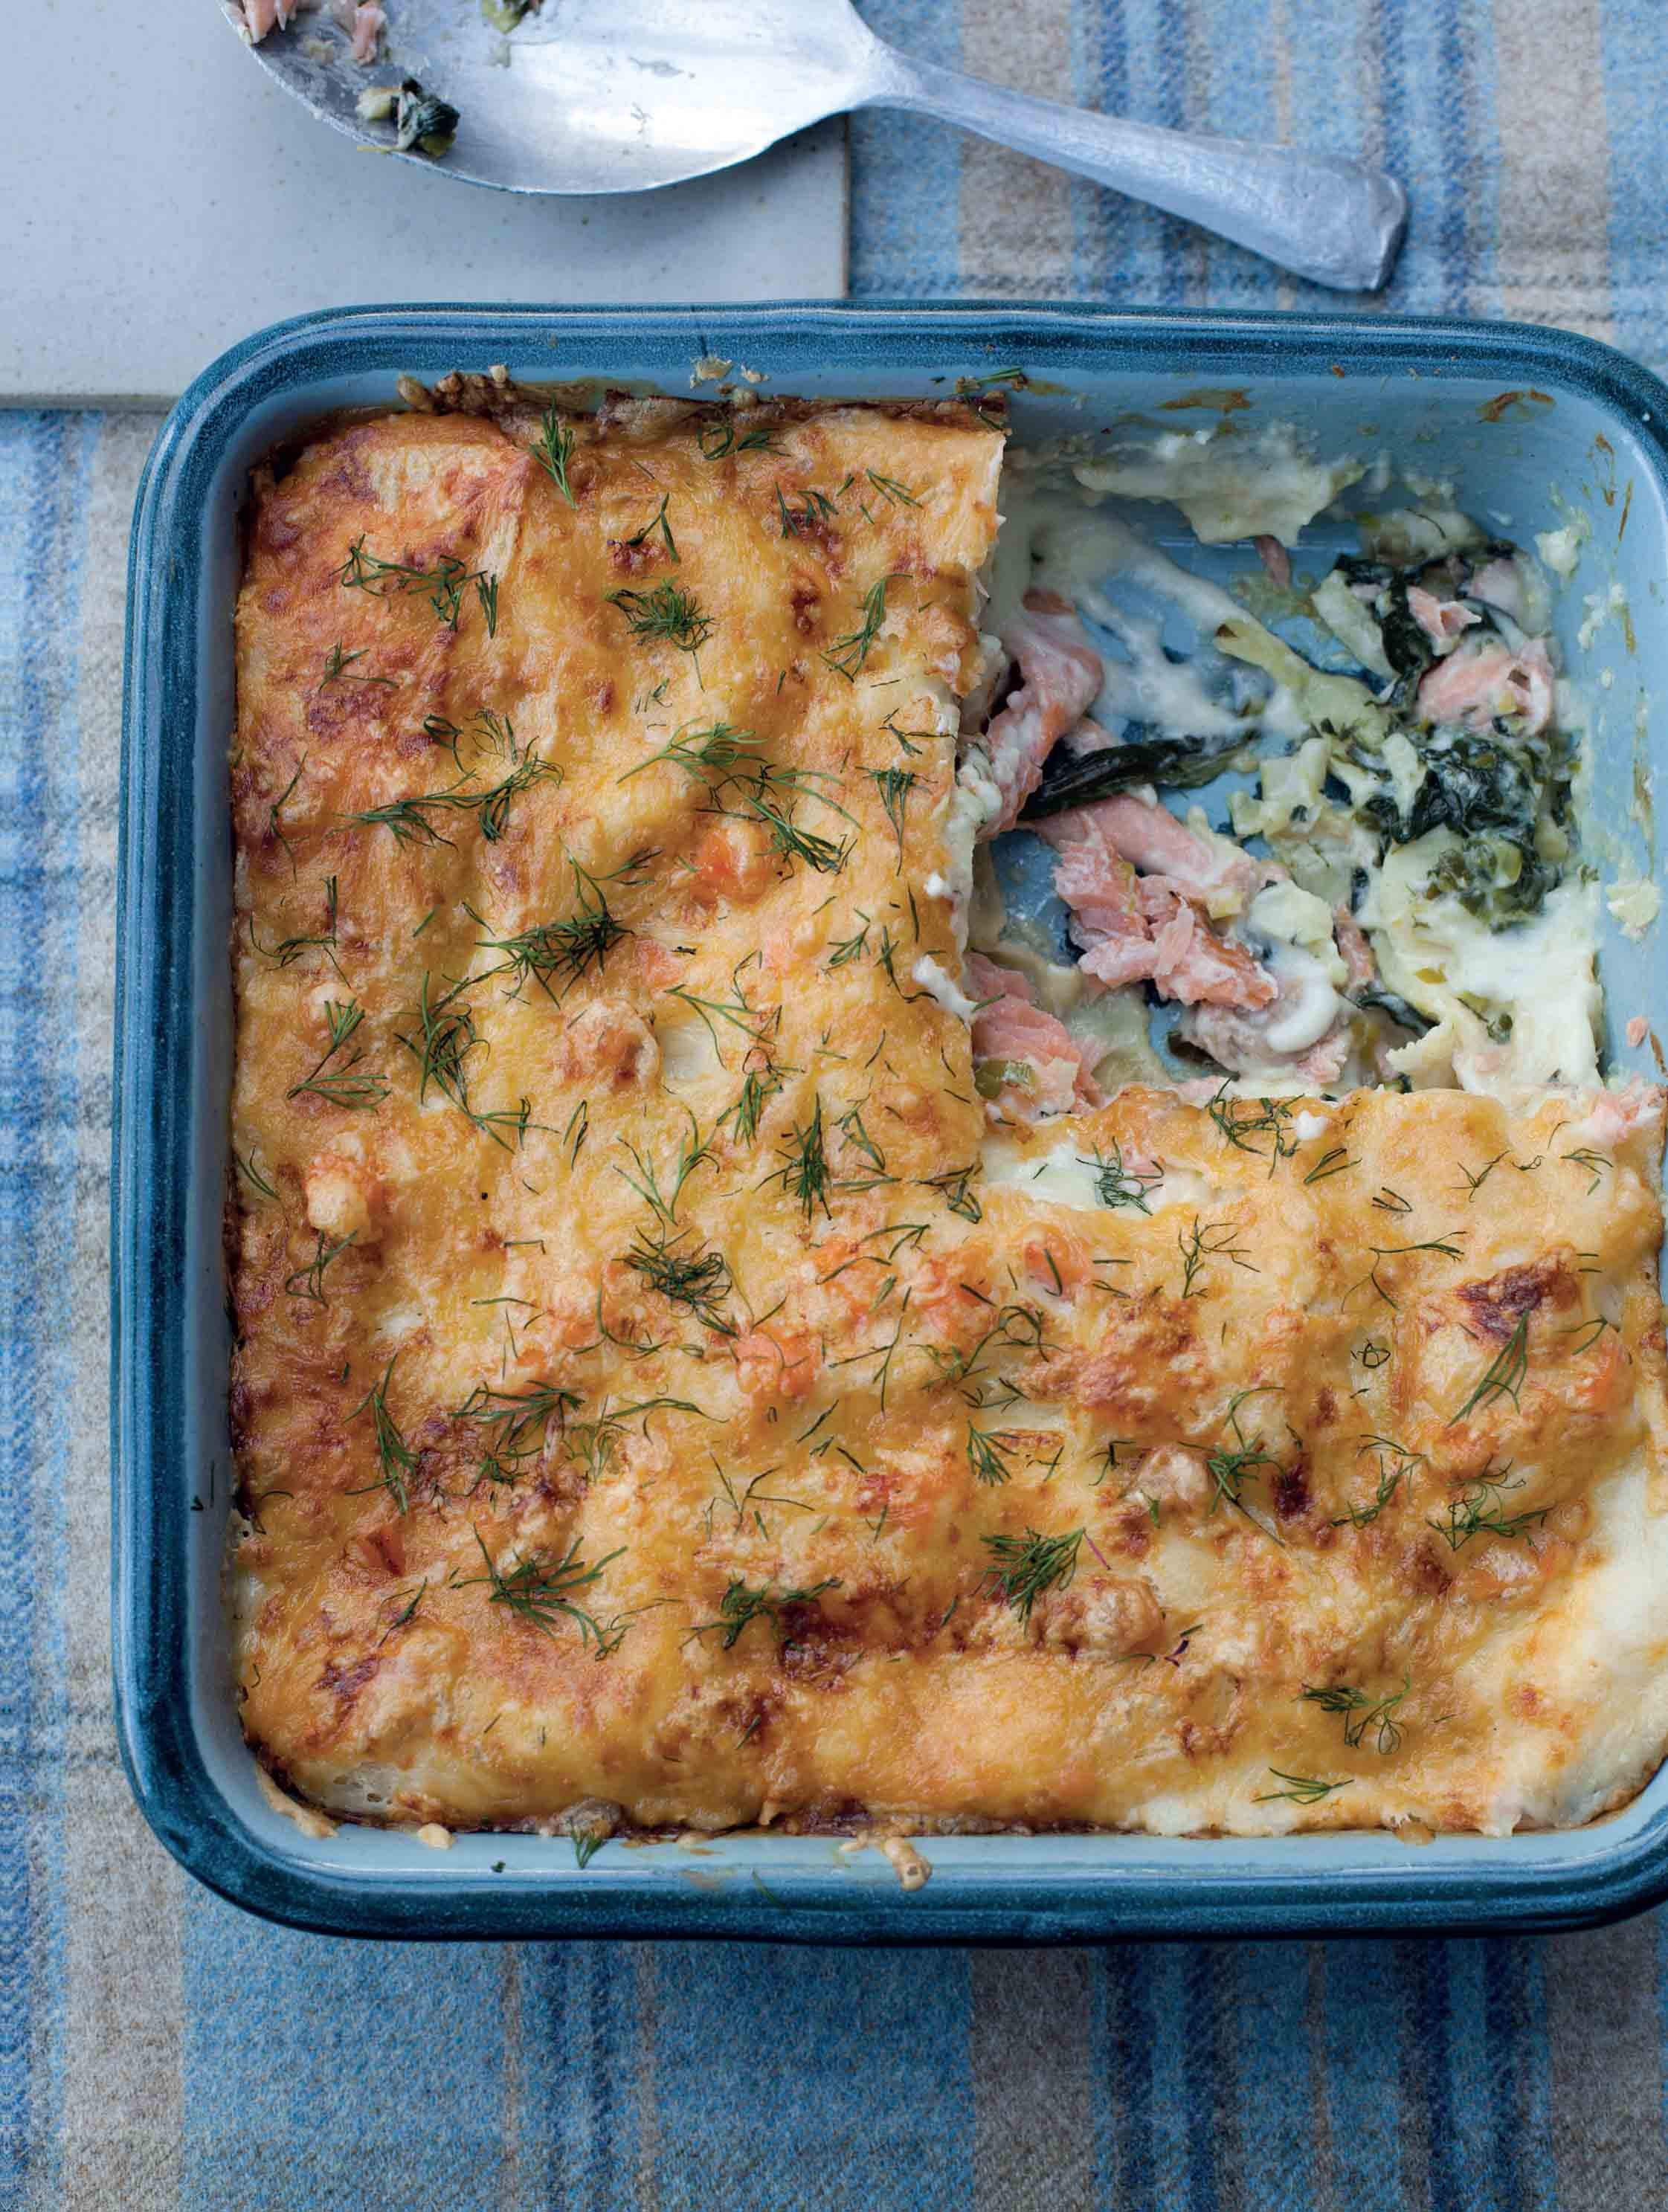 Tom Kitchin's Smoked Salmon & Spinach Lasagne